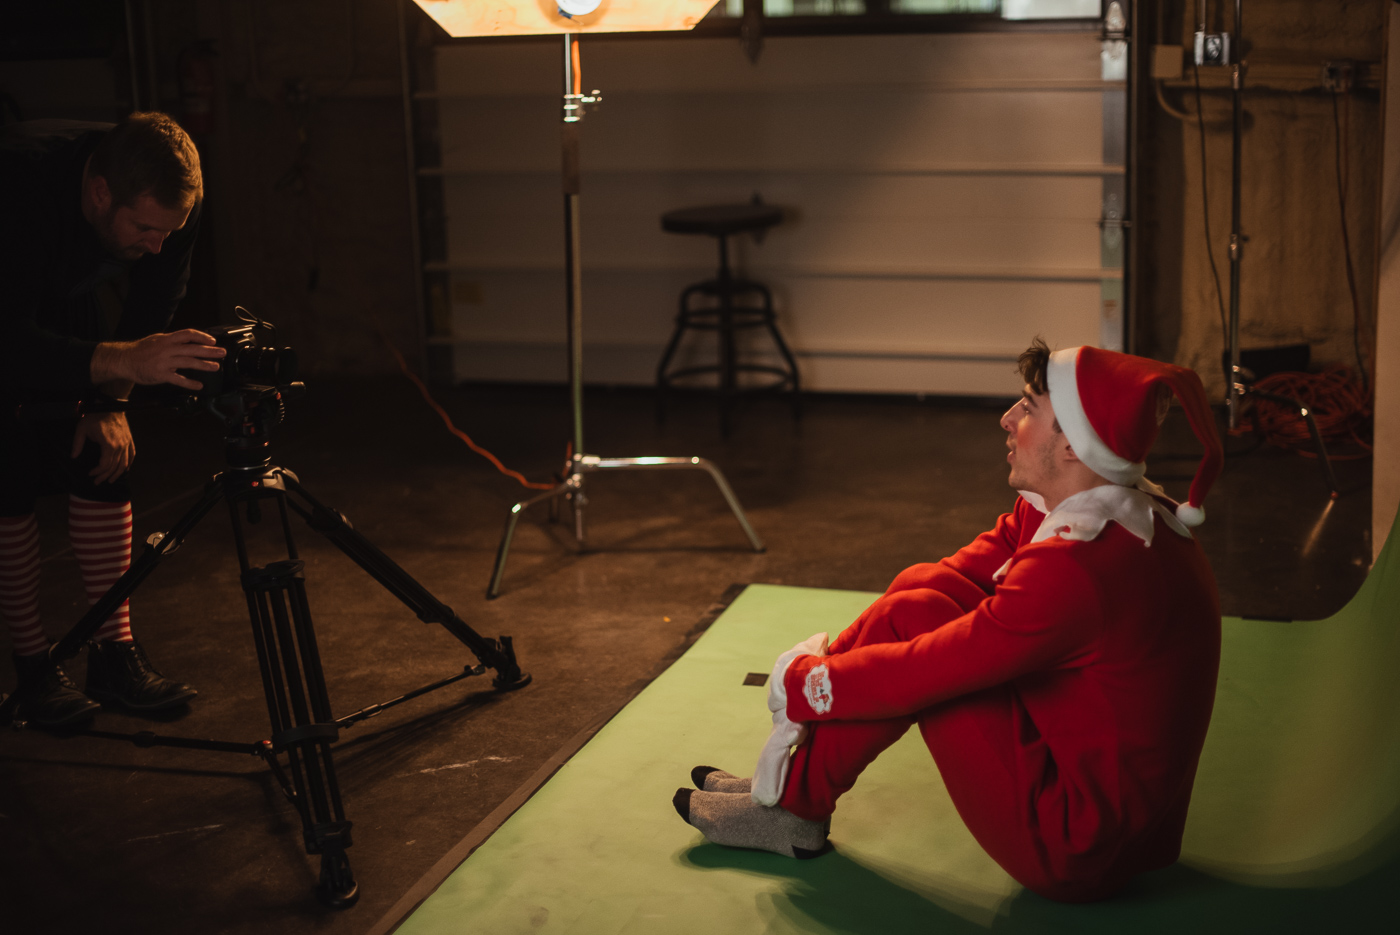 PHOCO Christmas Card The Articulate Photo Studio Green Screen Colorado Fort Collins Photographer Elf on the Shelf BTS-4.jpg